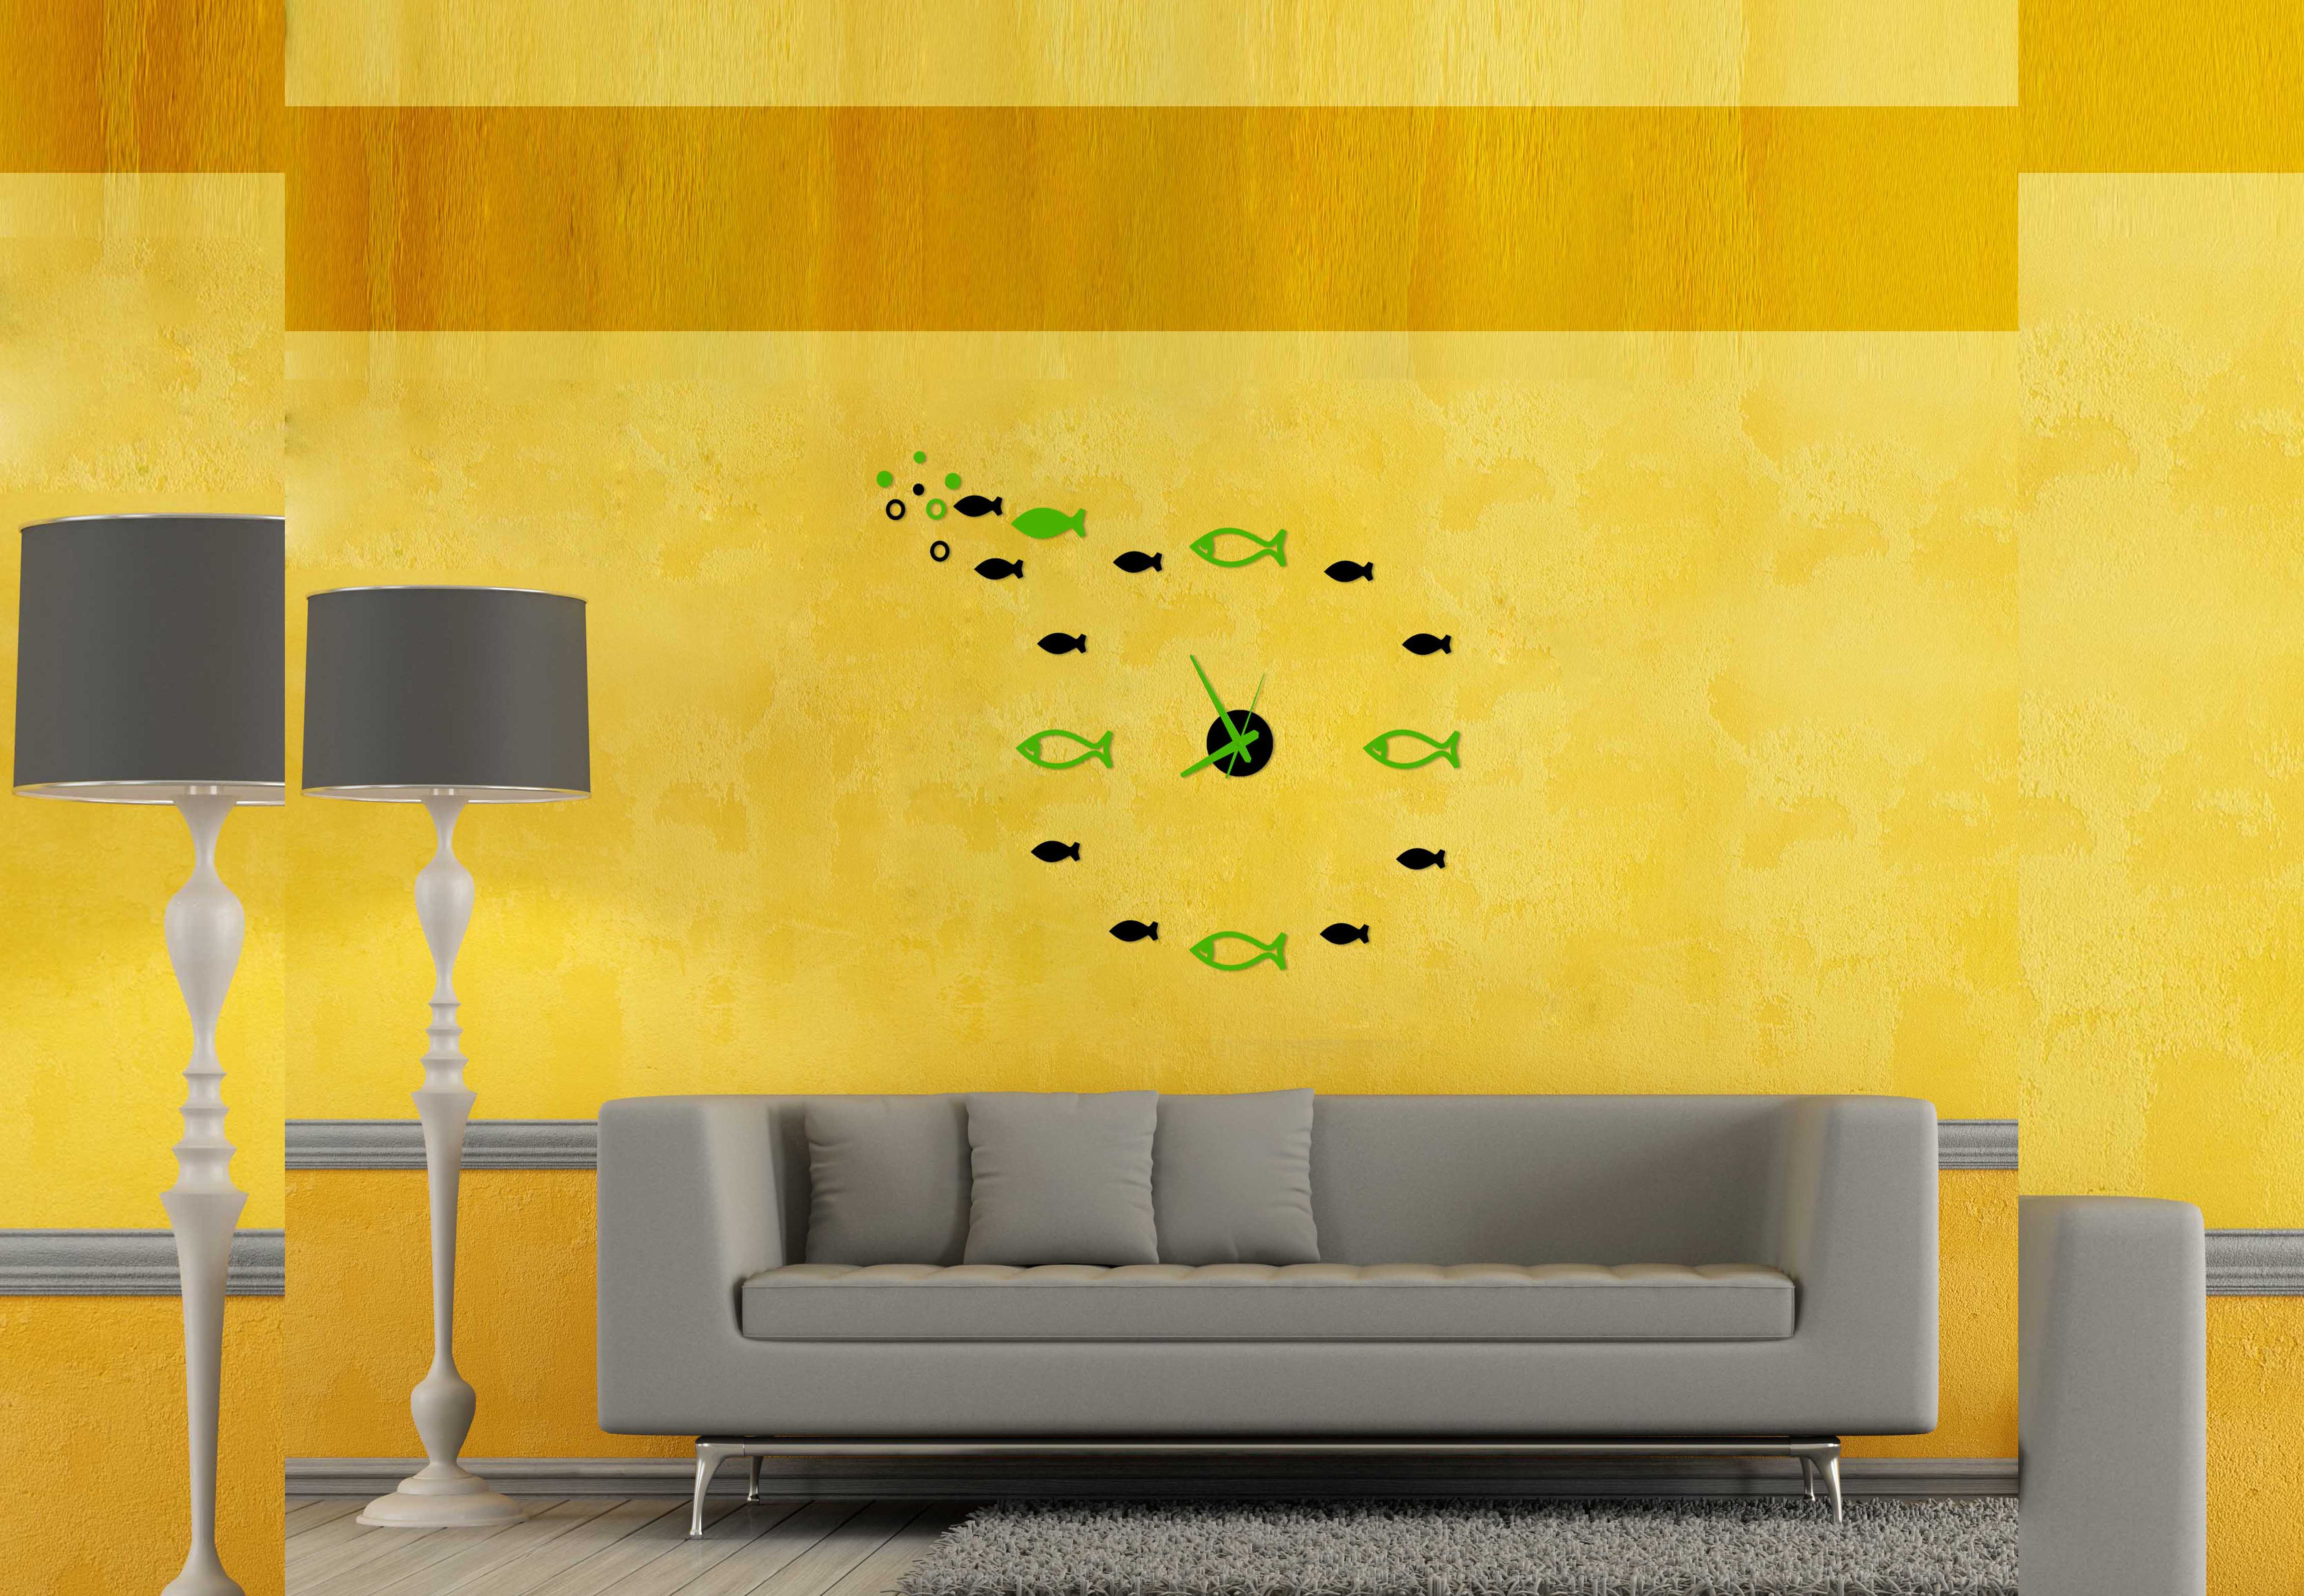 TimeIt Designer DIY Analog Wall Clock - Magic Wand - Green, Black